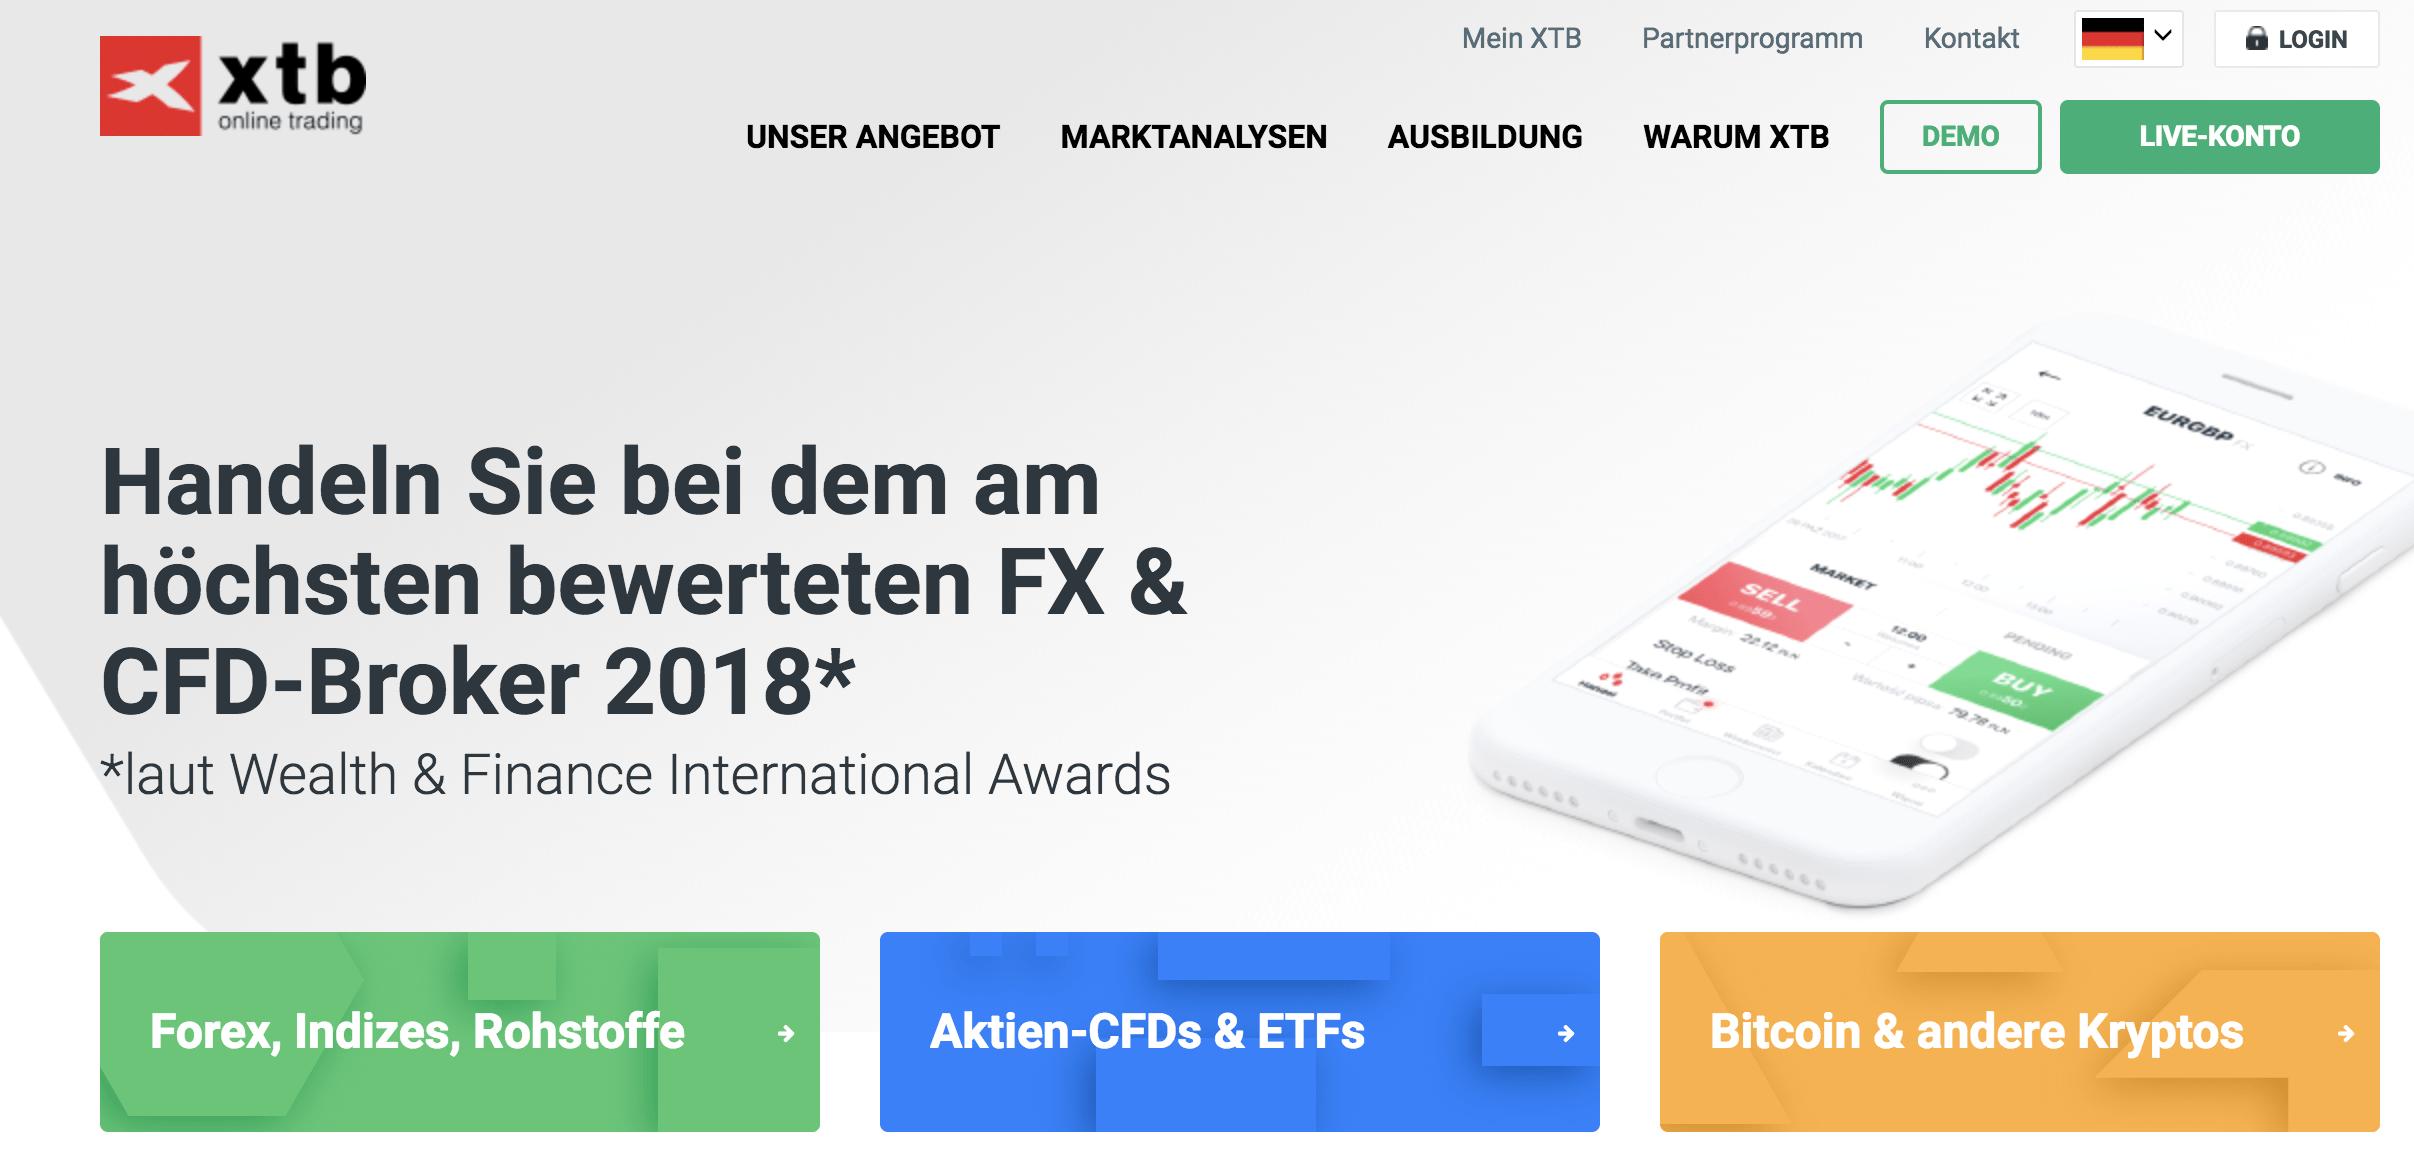 Xtb forex verseny 2019